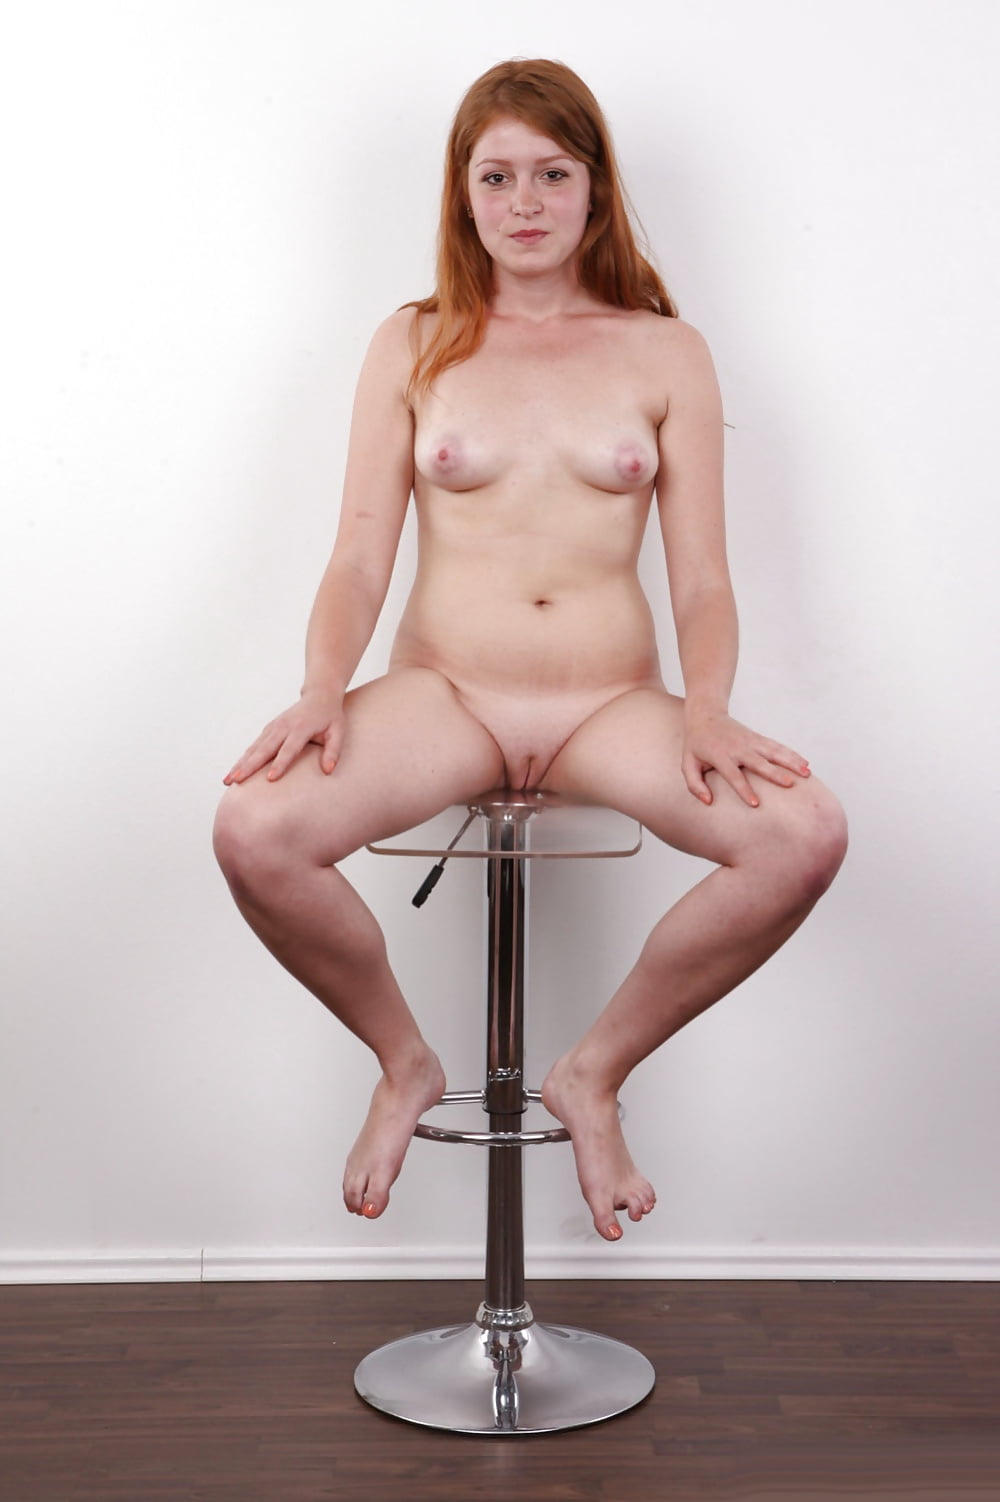 Ariel genitals chek casting nude